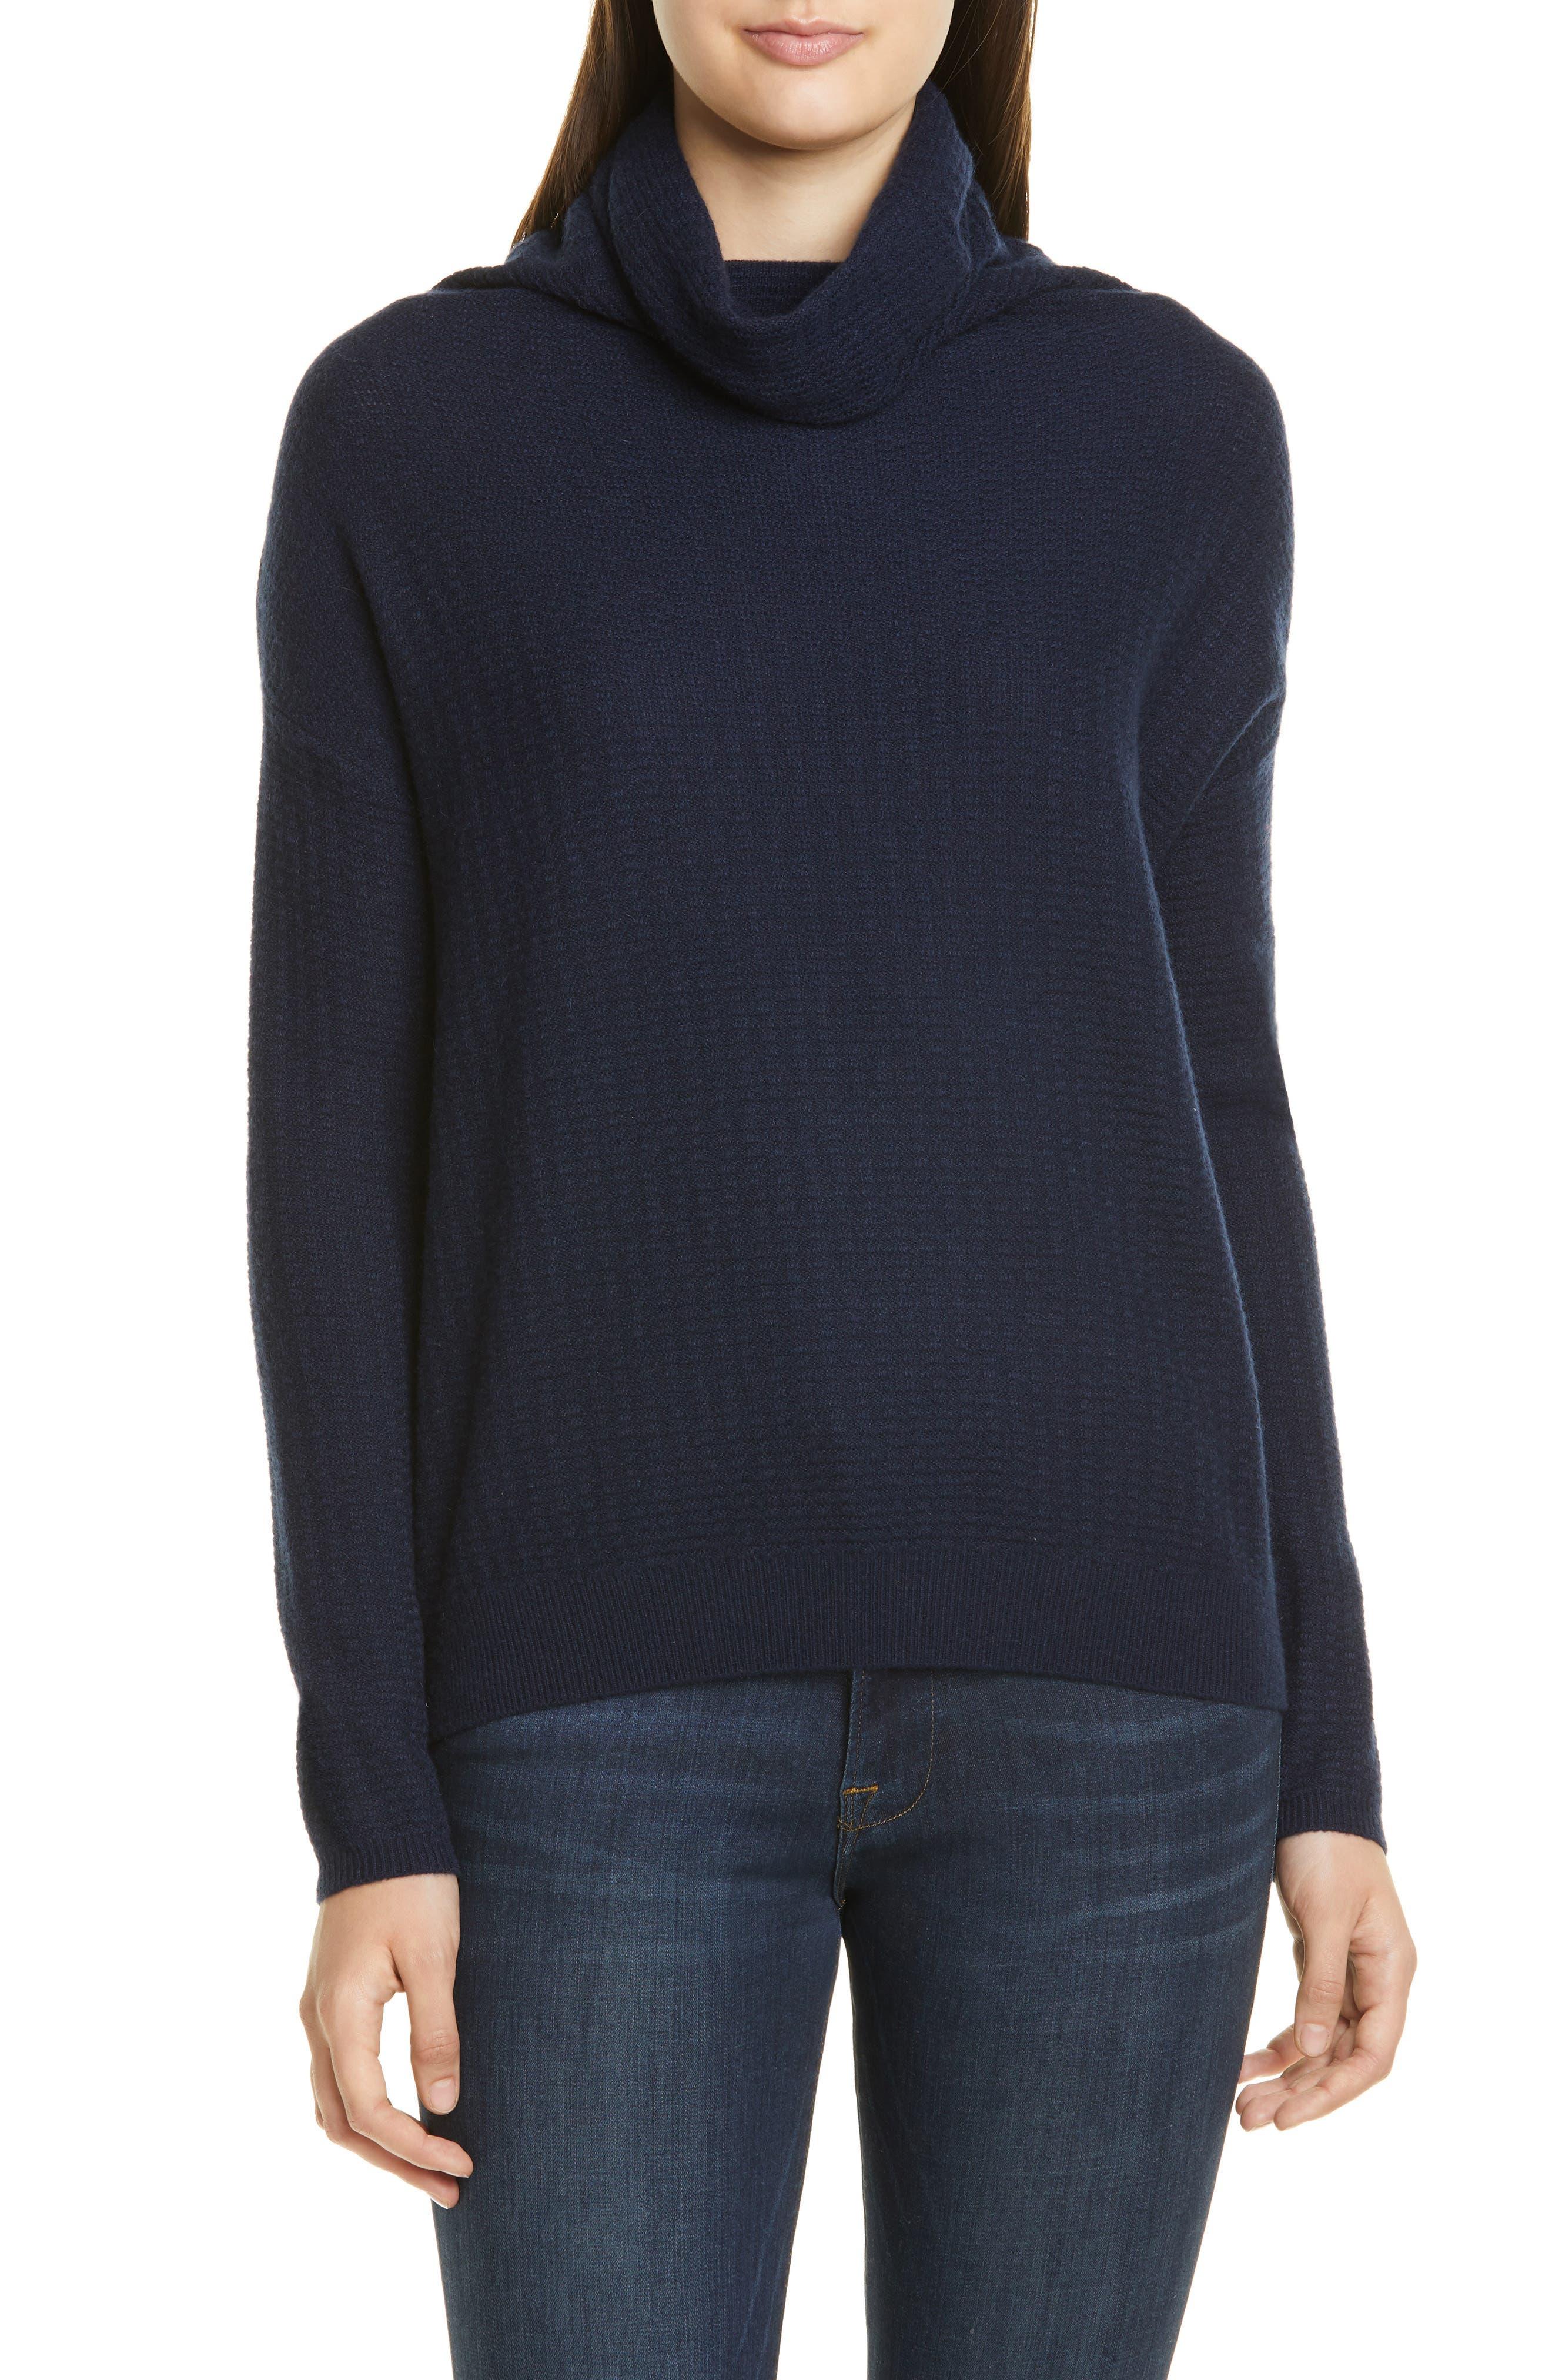 Nordstrom Signature Scrunch Neck Cashmere Sweater